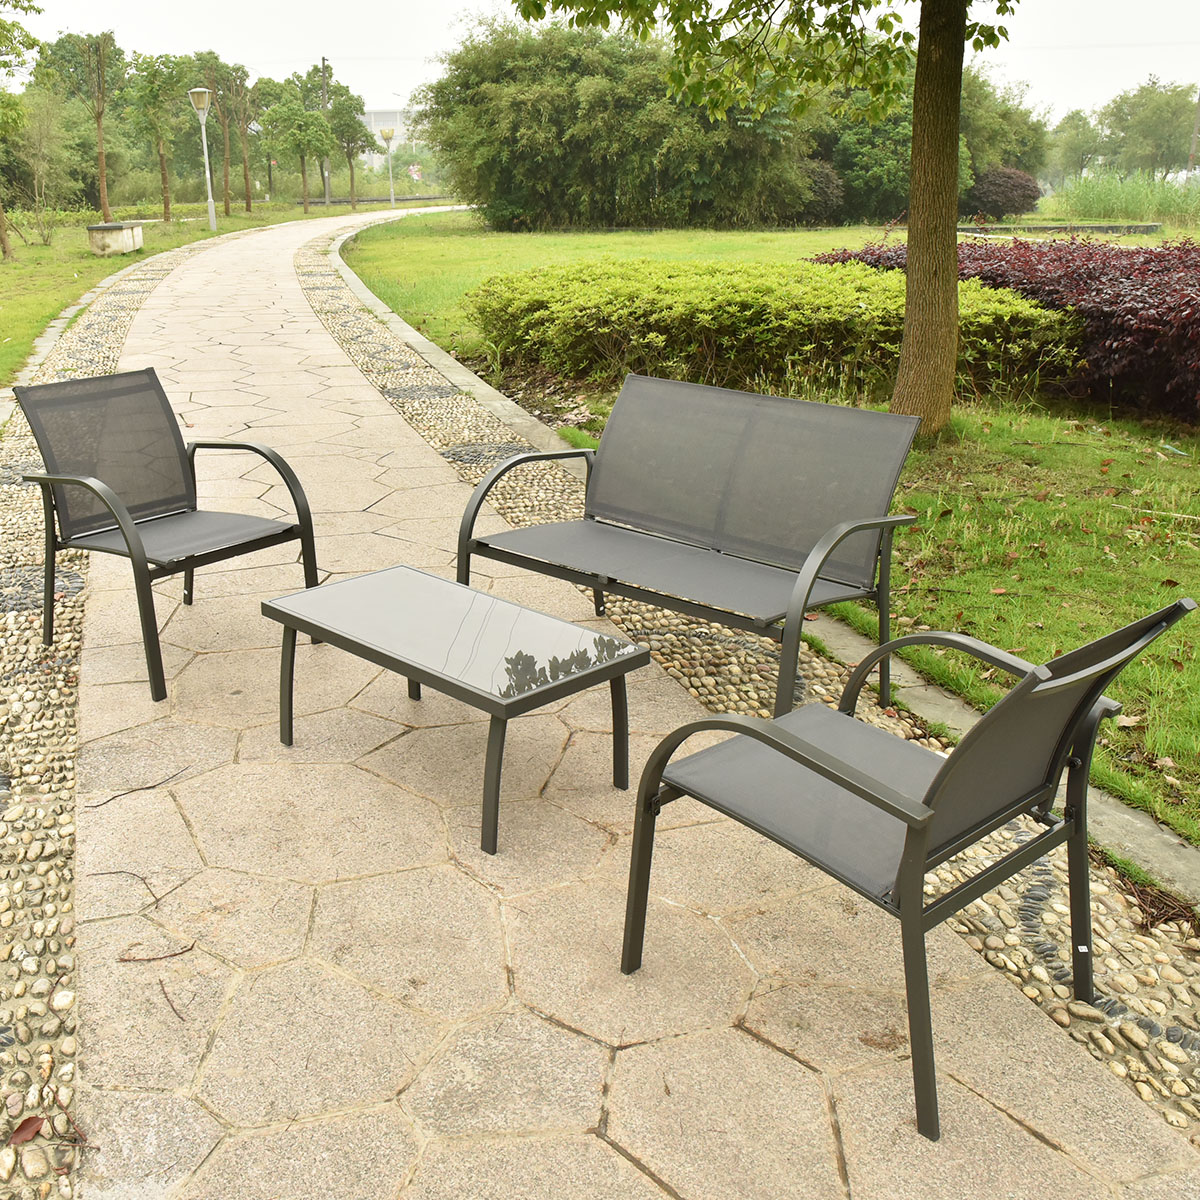 garden sets costway 4pcs patio garden furniture set steel frame outdoor lawn sofa OAFWVVR